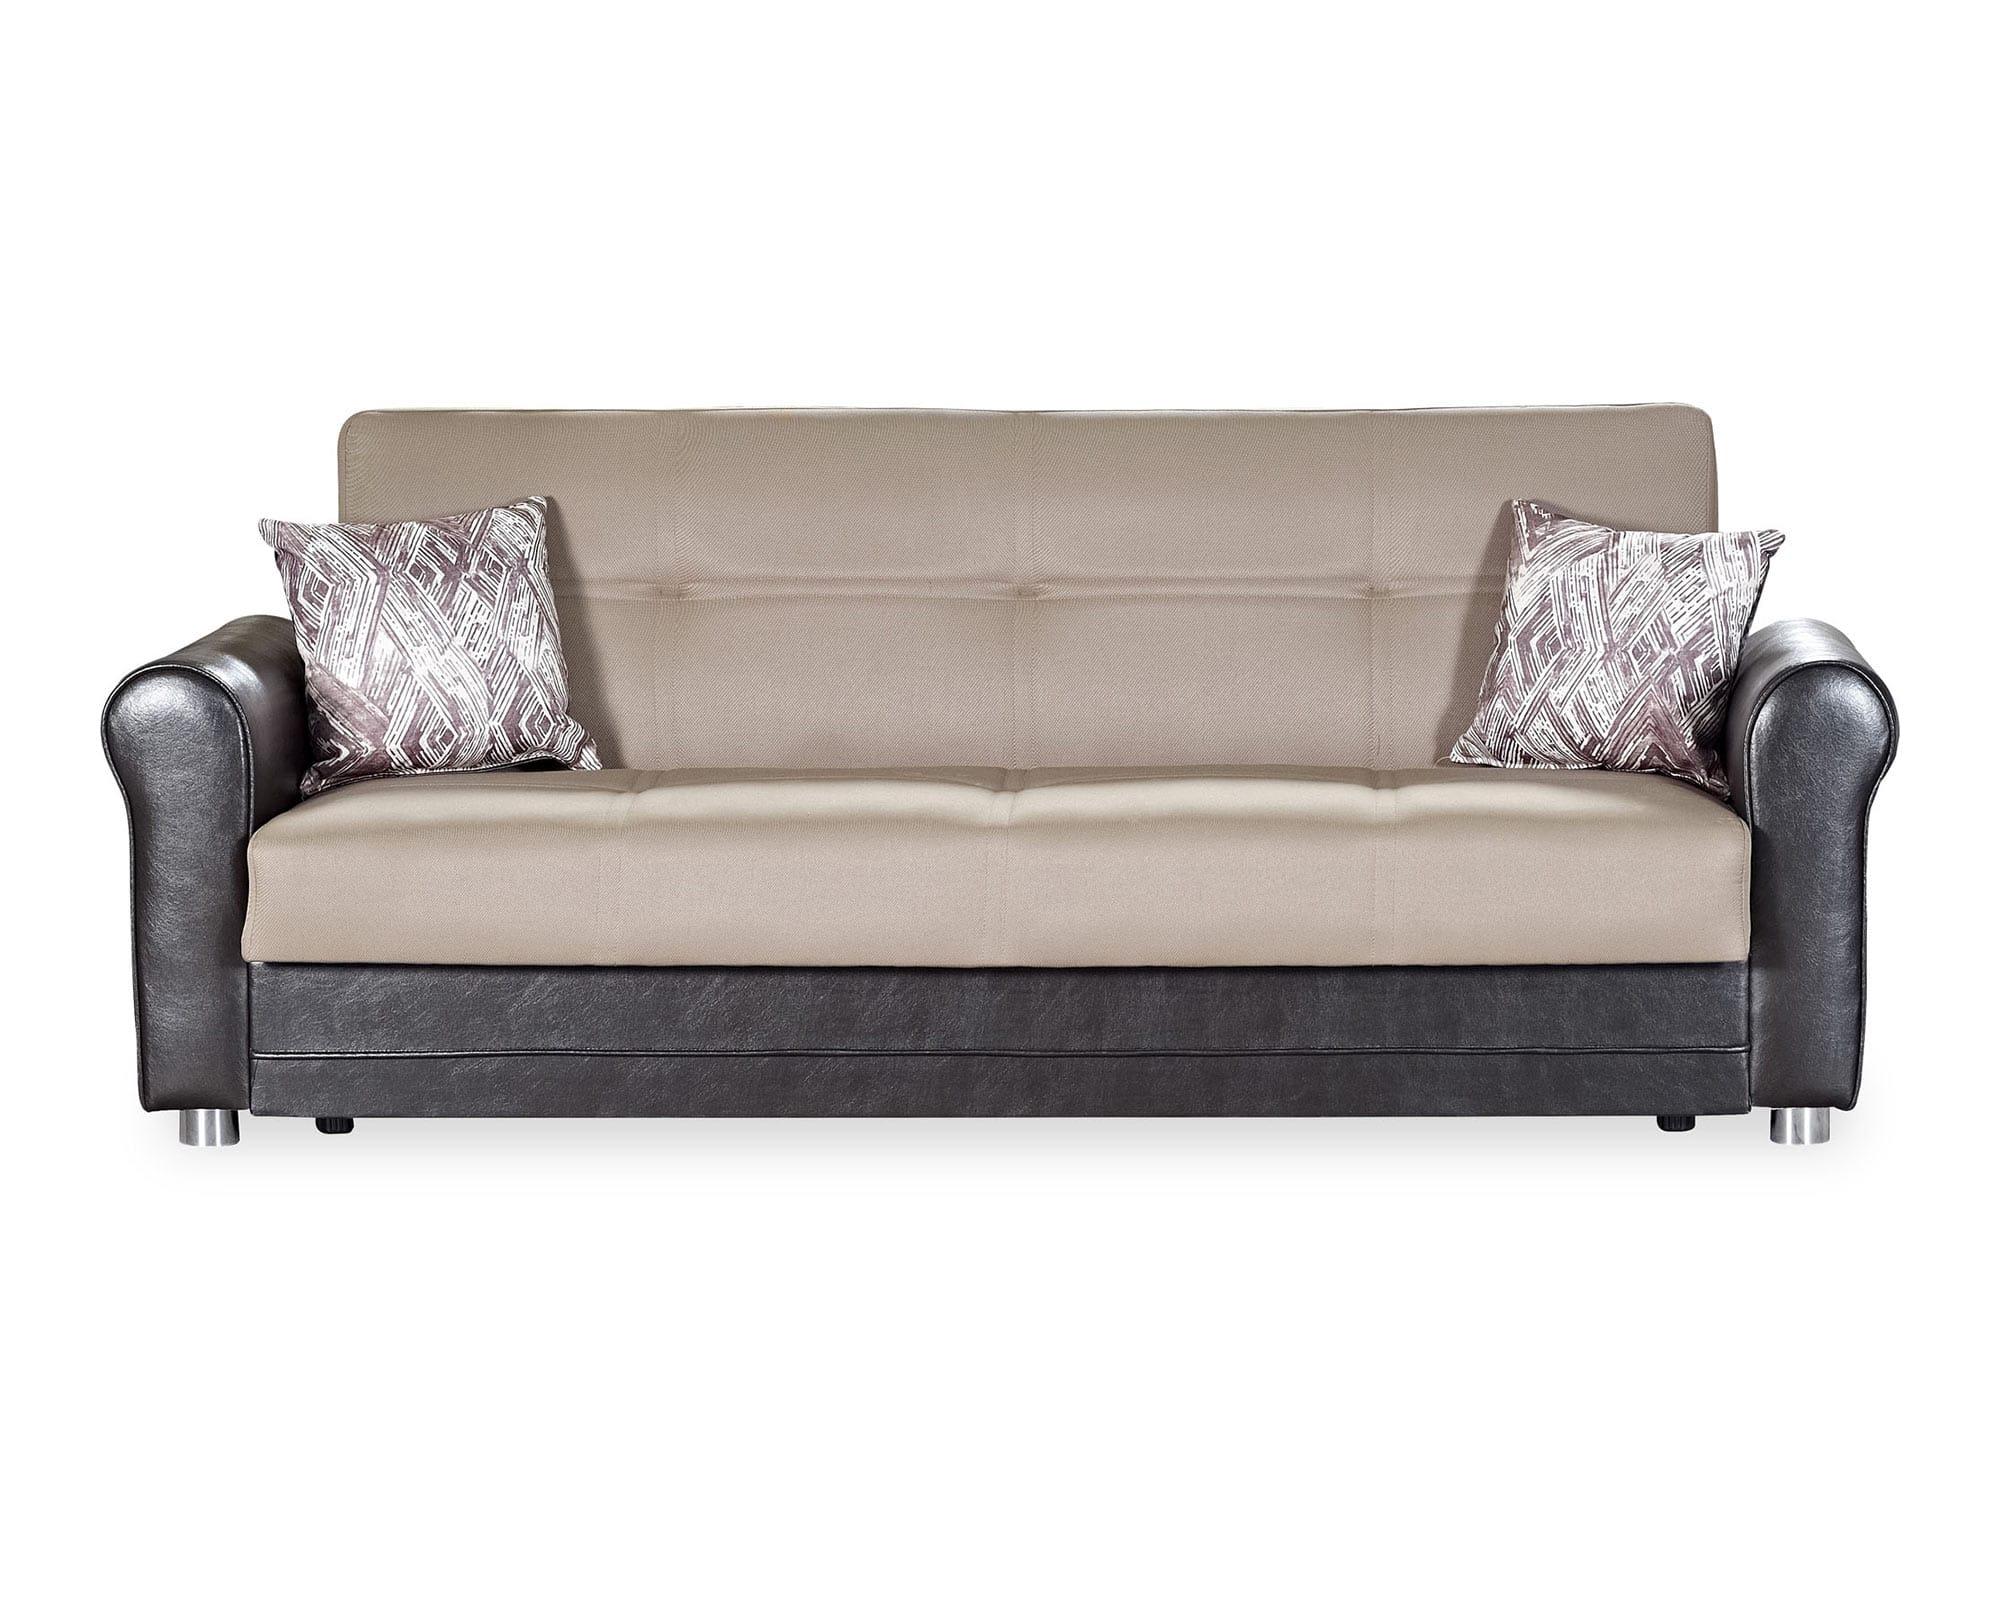 Avalon Plus Dark Beige Convertible Sofa By Casamode